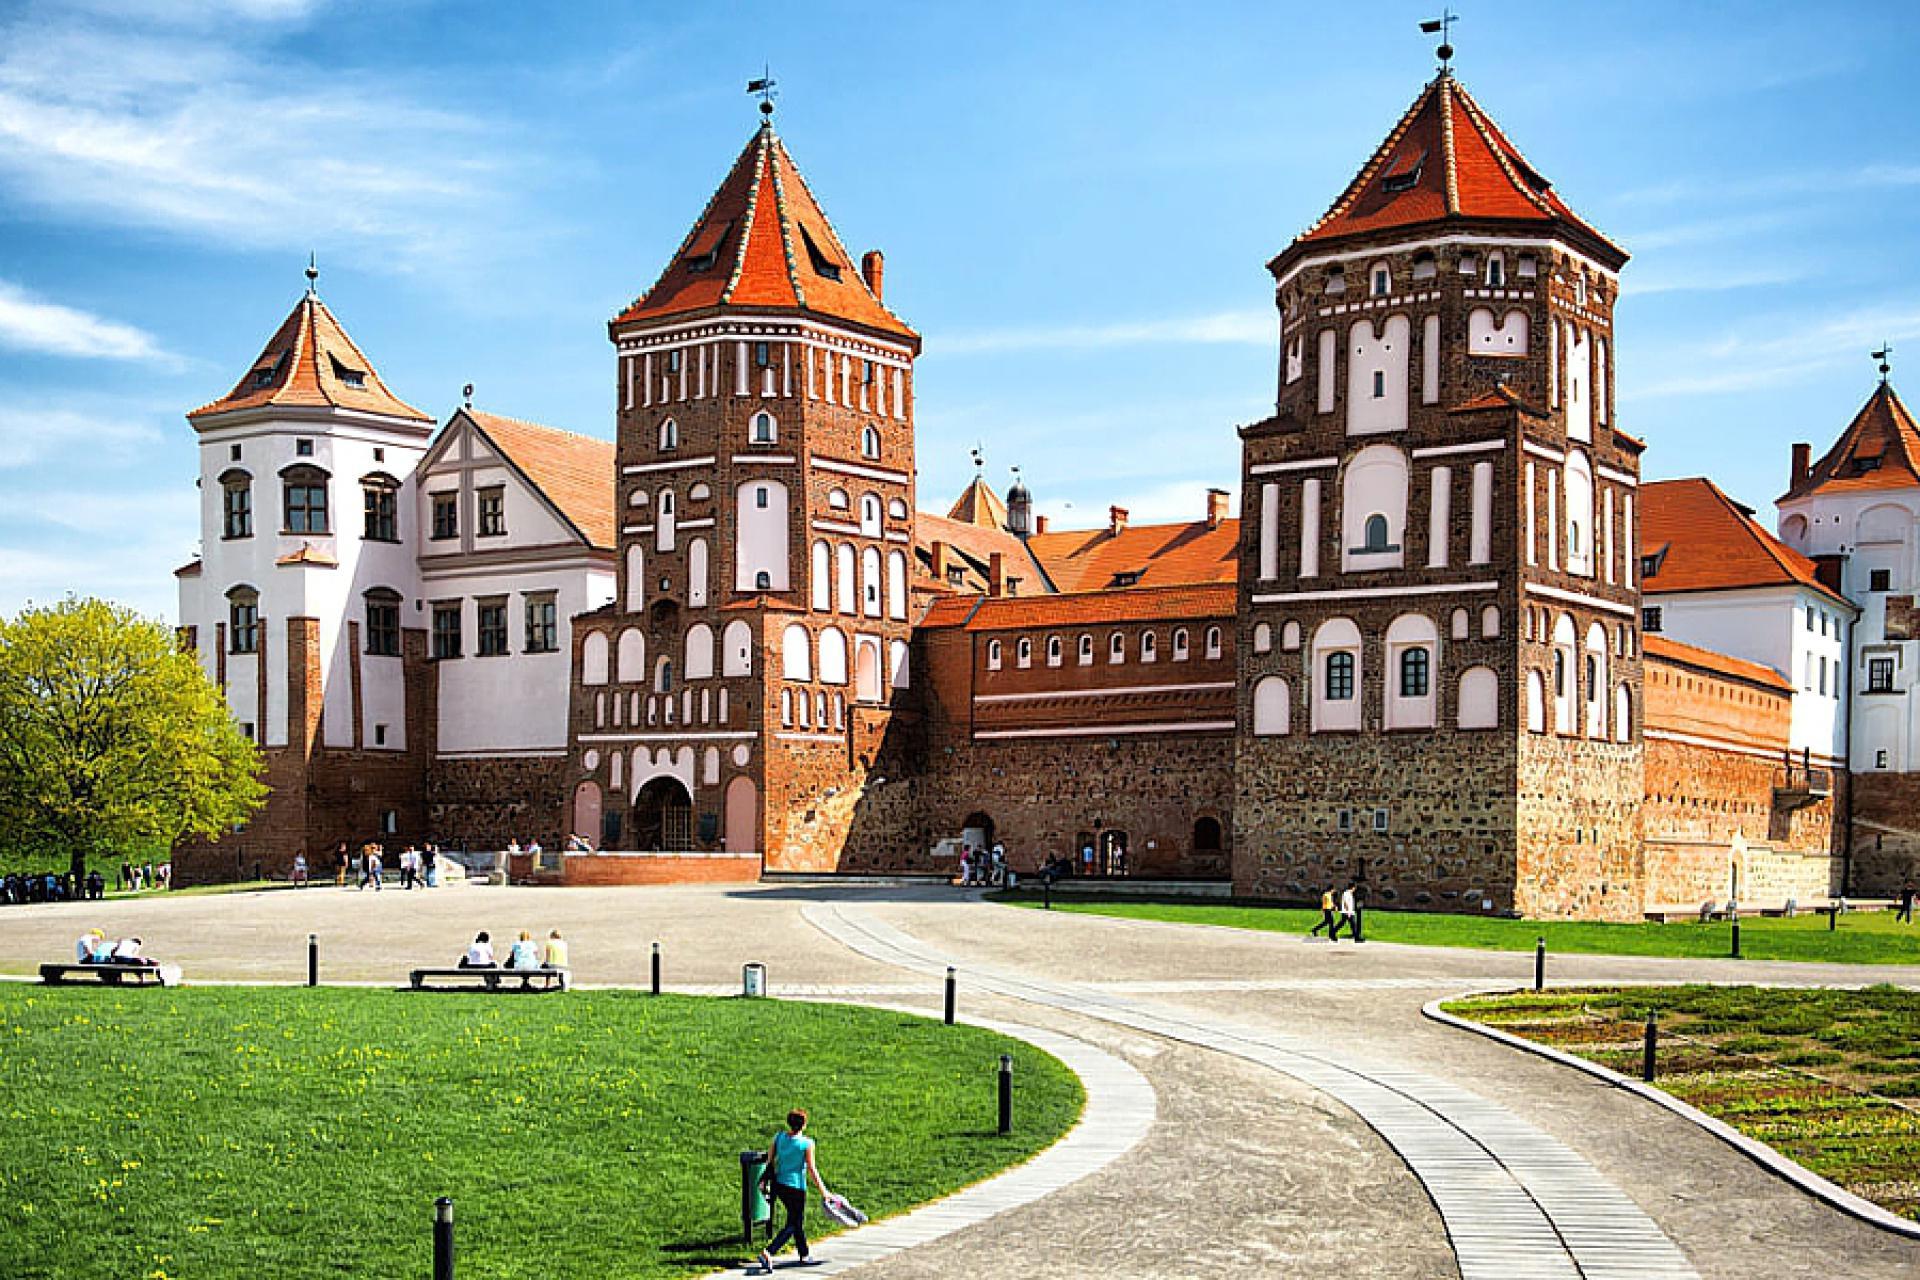 Агентство по туризму ждёт идеи для создания бренда Беларуси